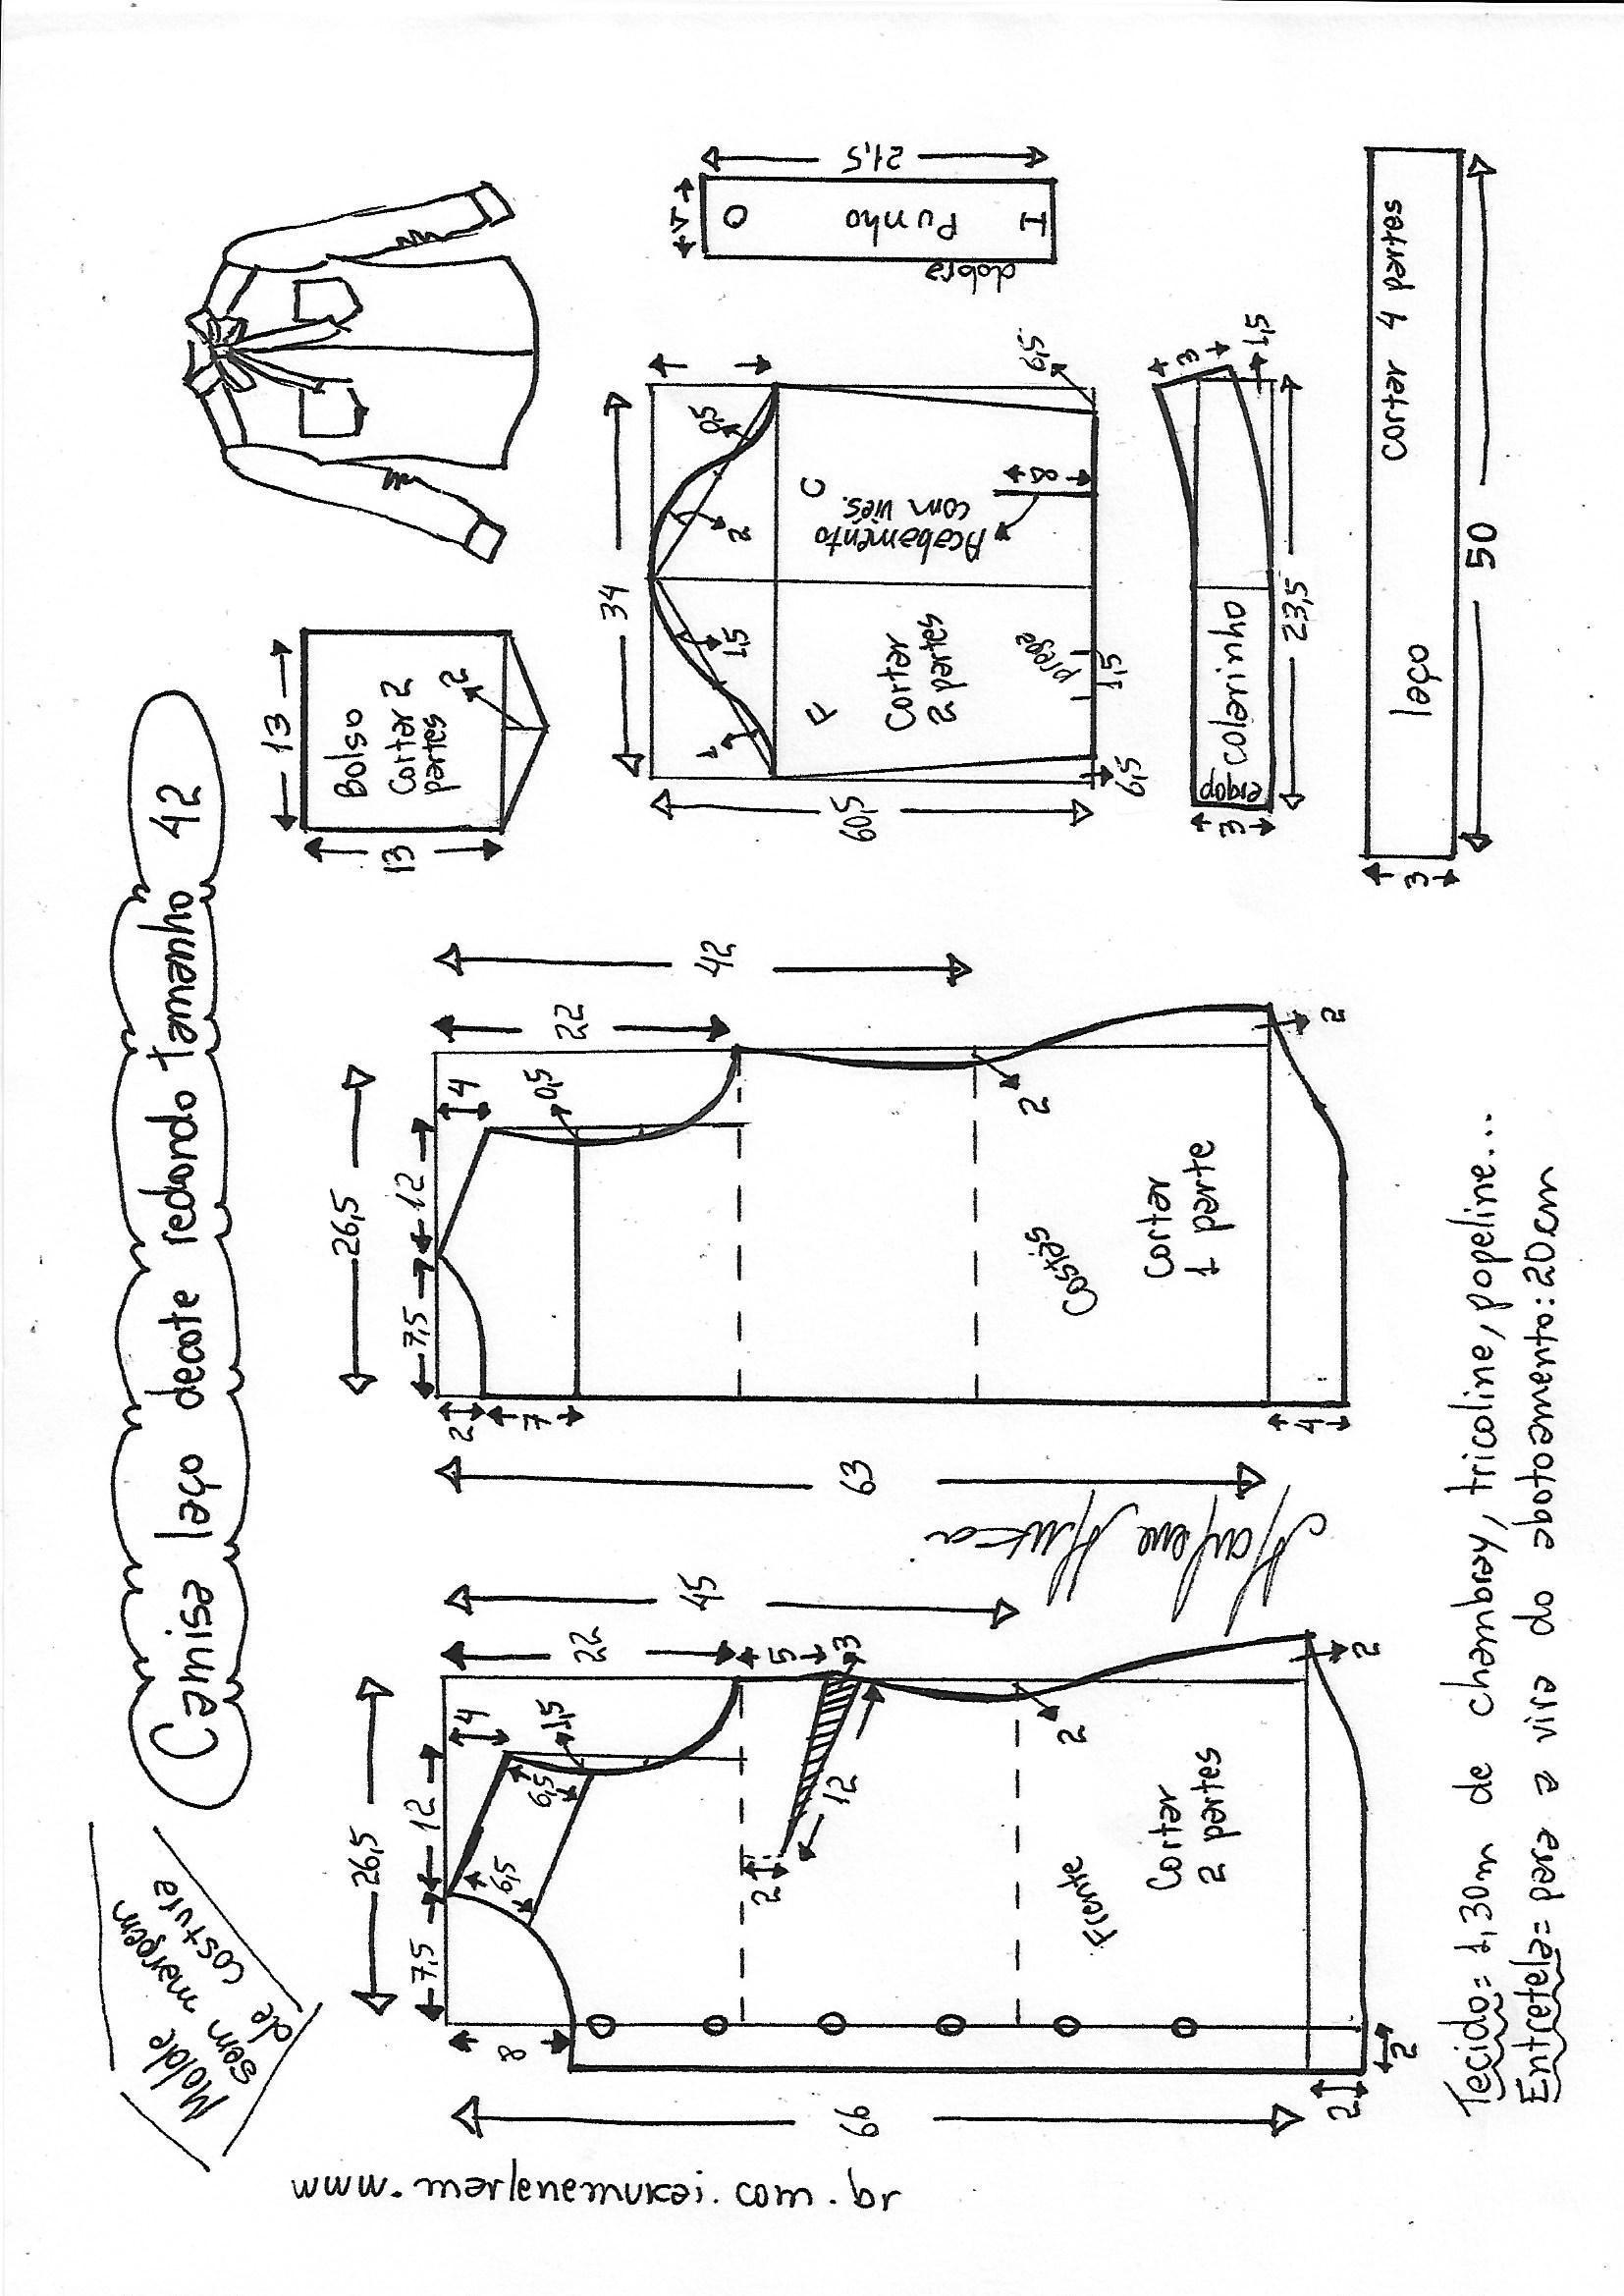 Truck Diagram Parts Clutch & Gearbox Parts Diagrams Leyland Pinterest Of Truck Diagram Parts